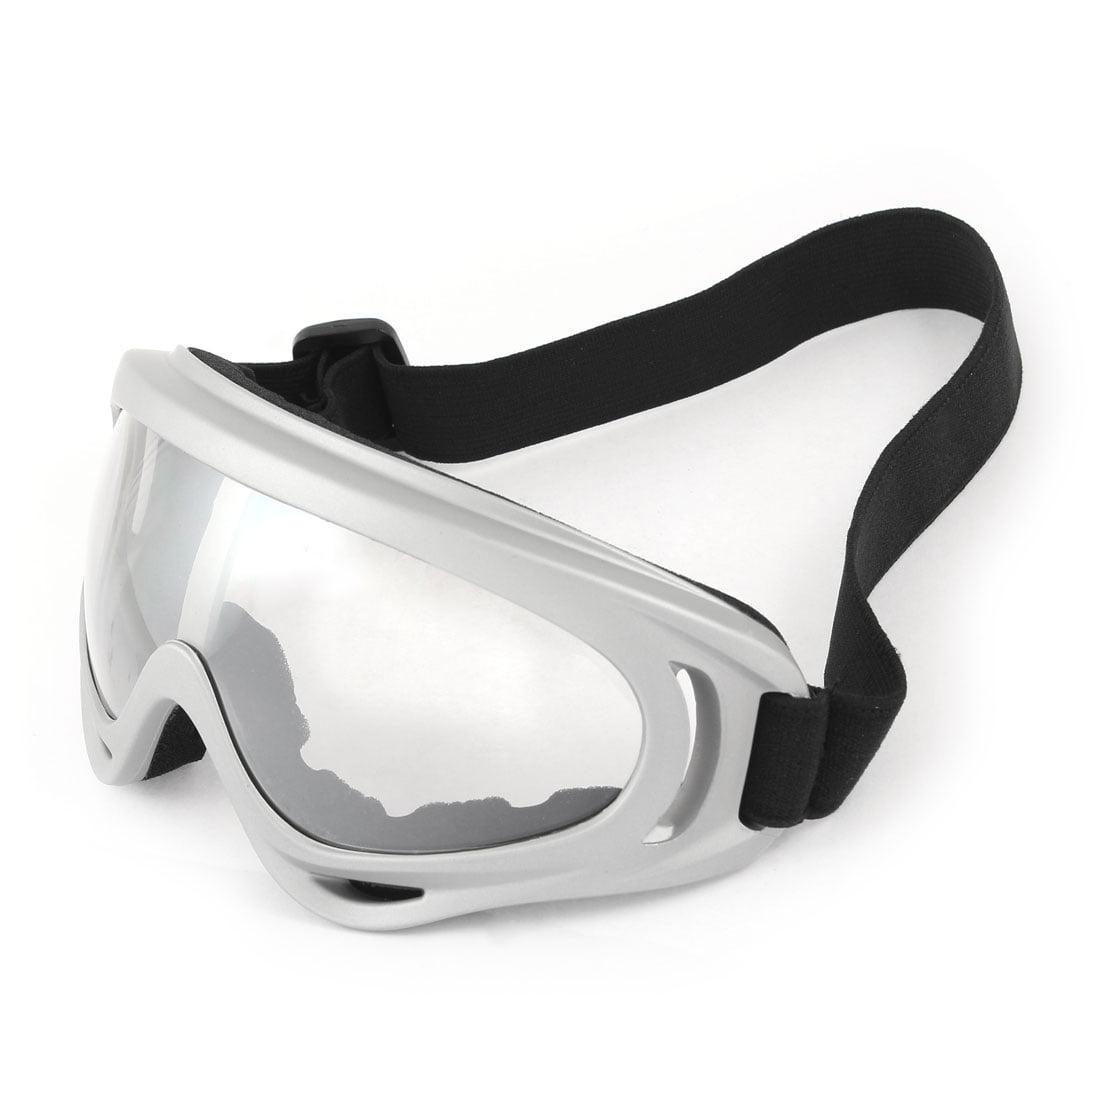 Unique Bargains Adjustable Strap Full Rim Skiing Snowboard Snow Goggles Sunglasses by Unique-Bargains